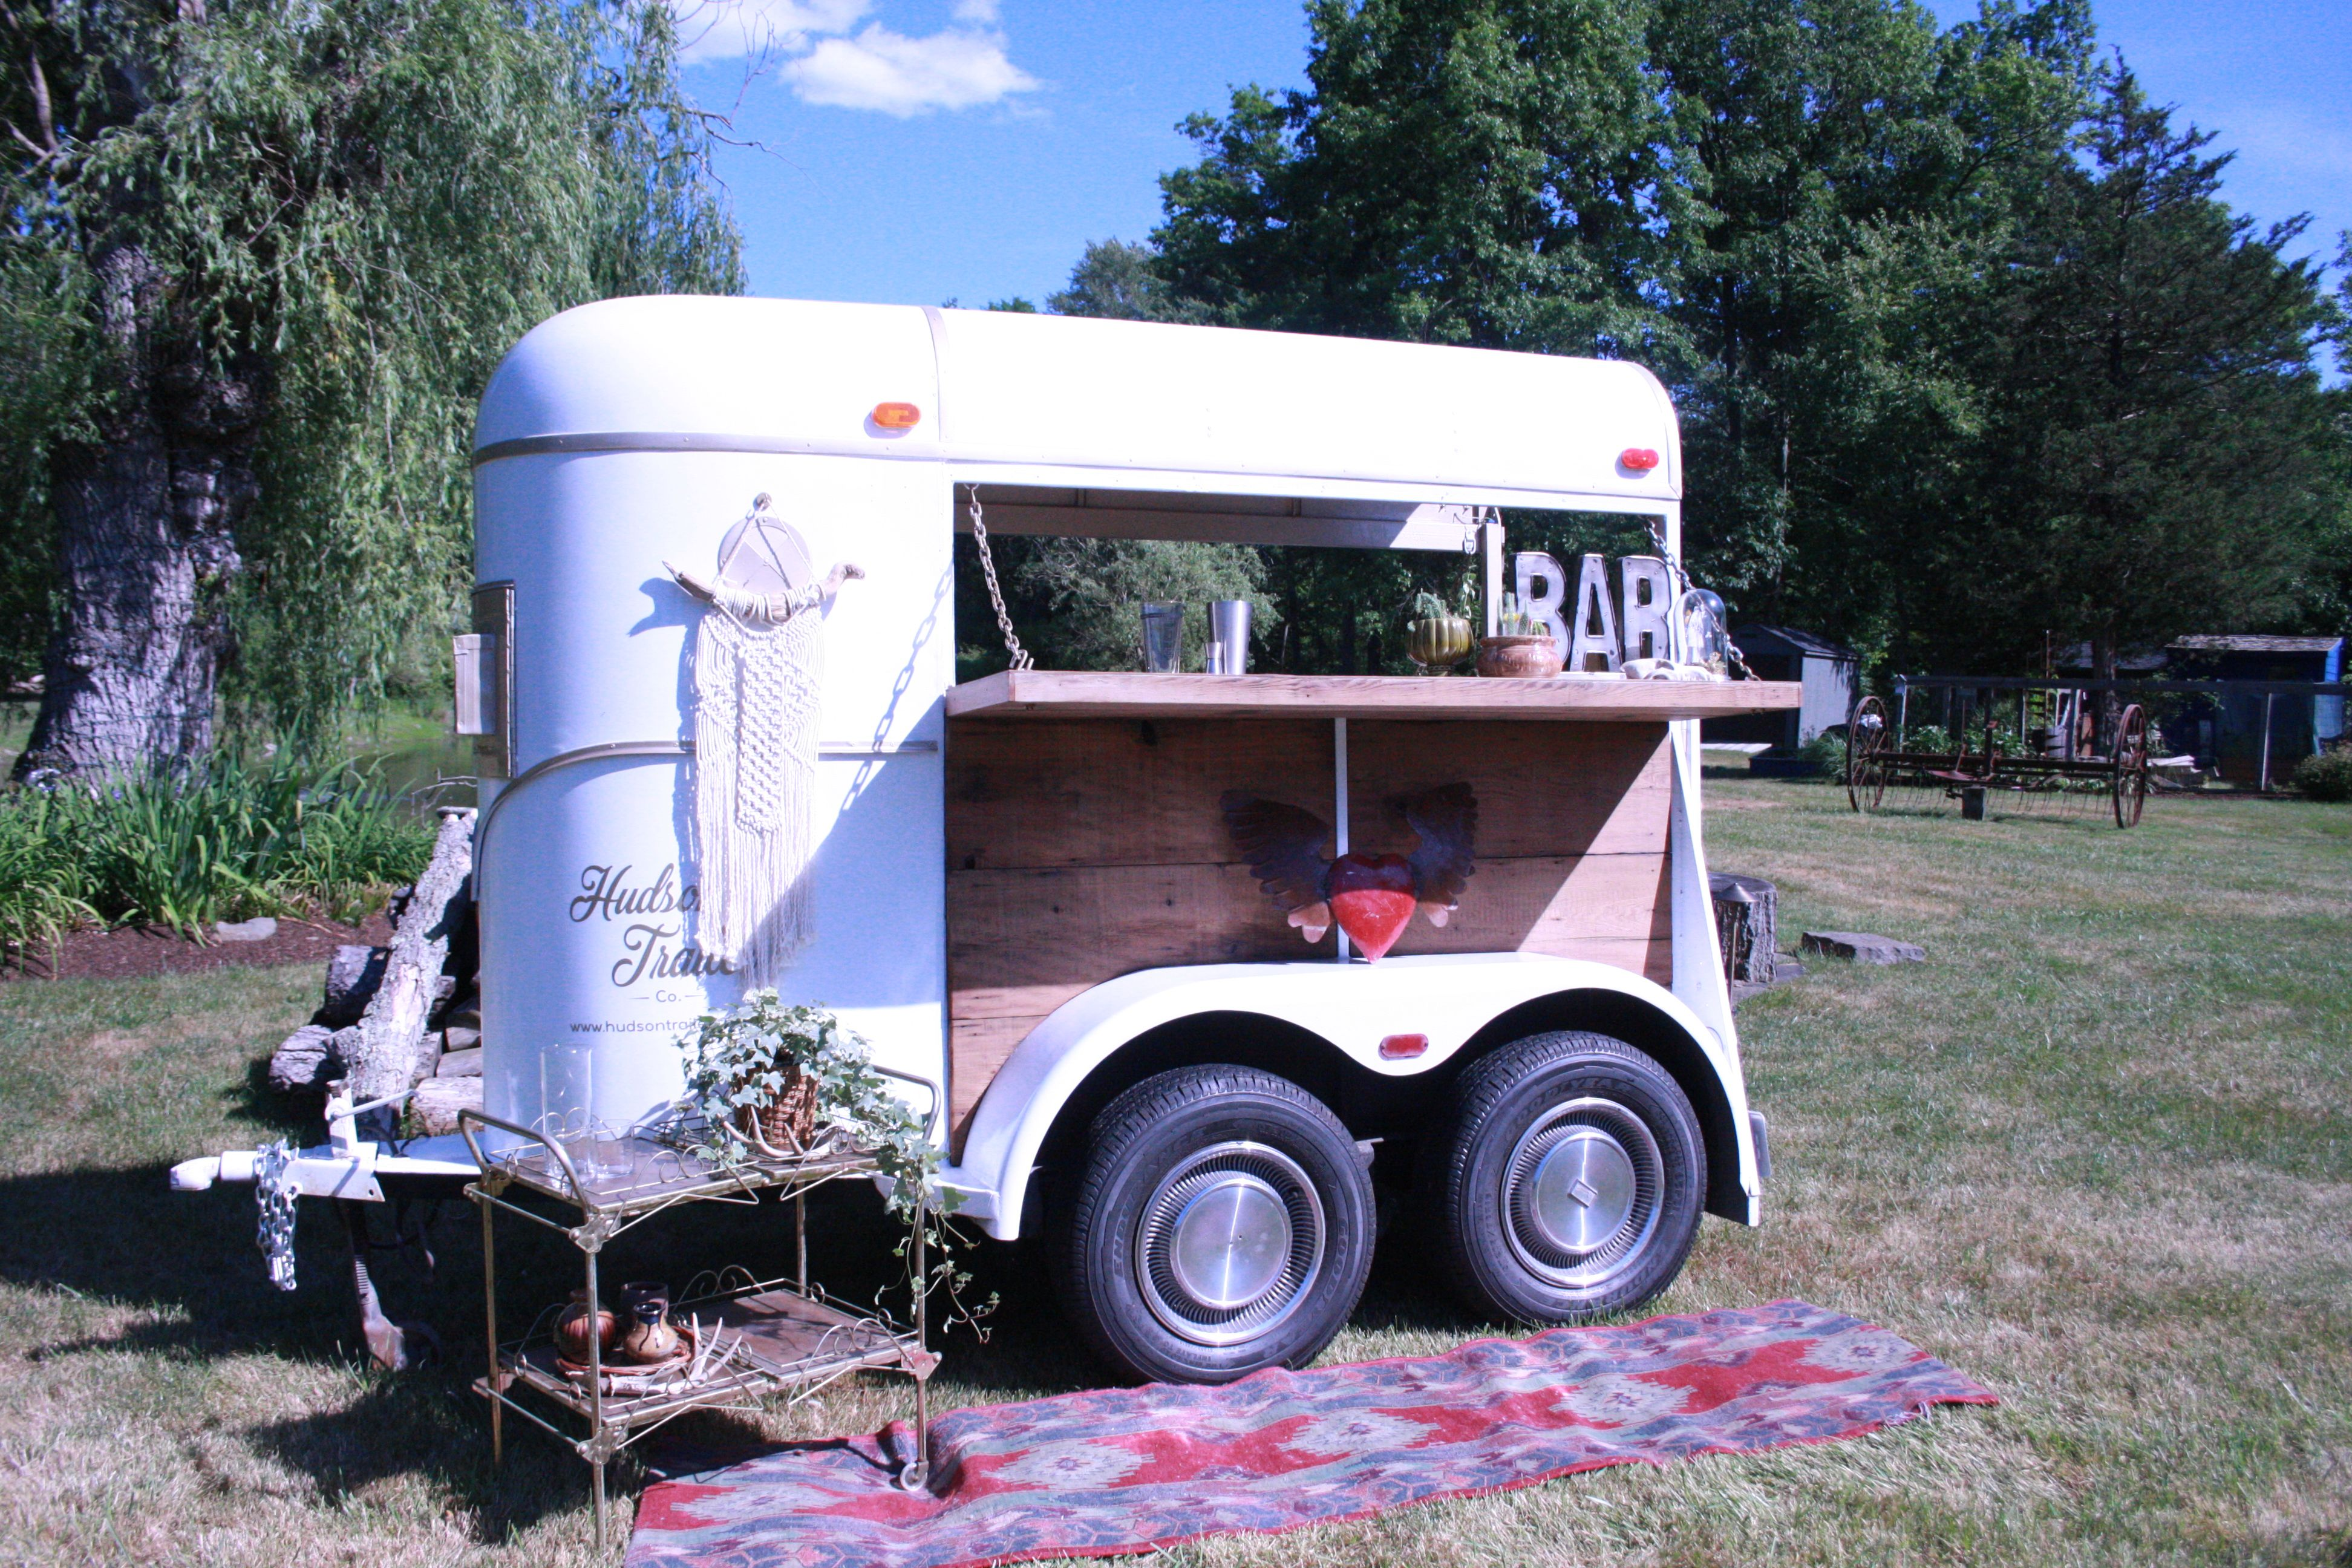 medium resolution of hudson trailer co camper bar trailer wedding trailer